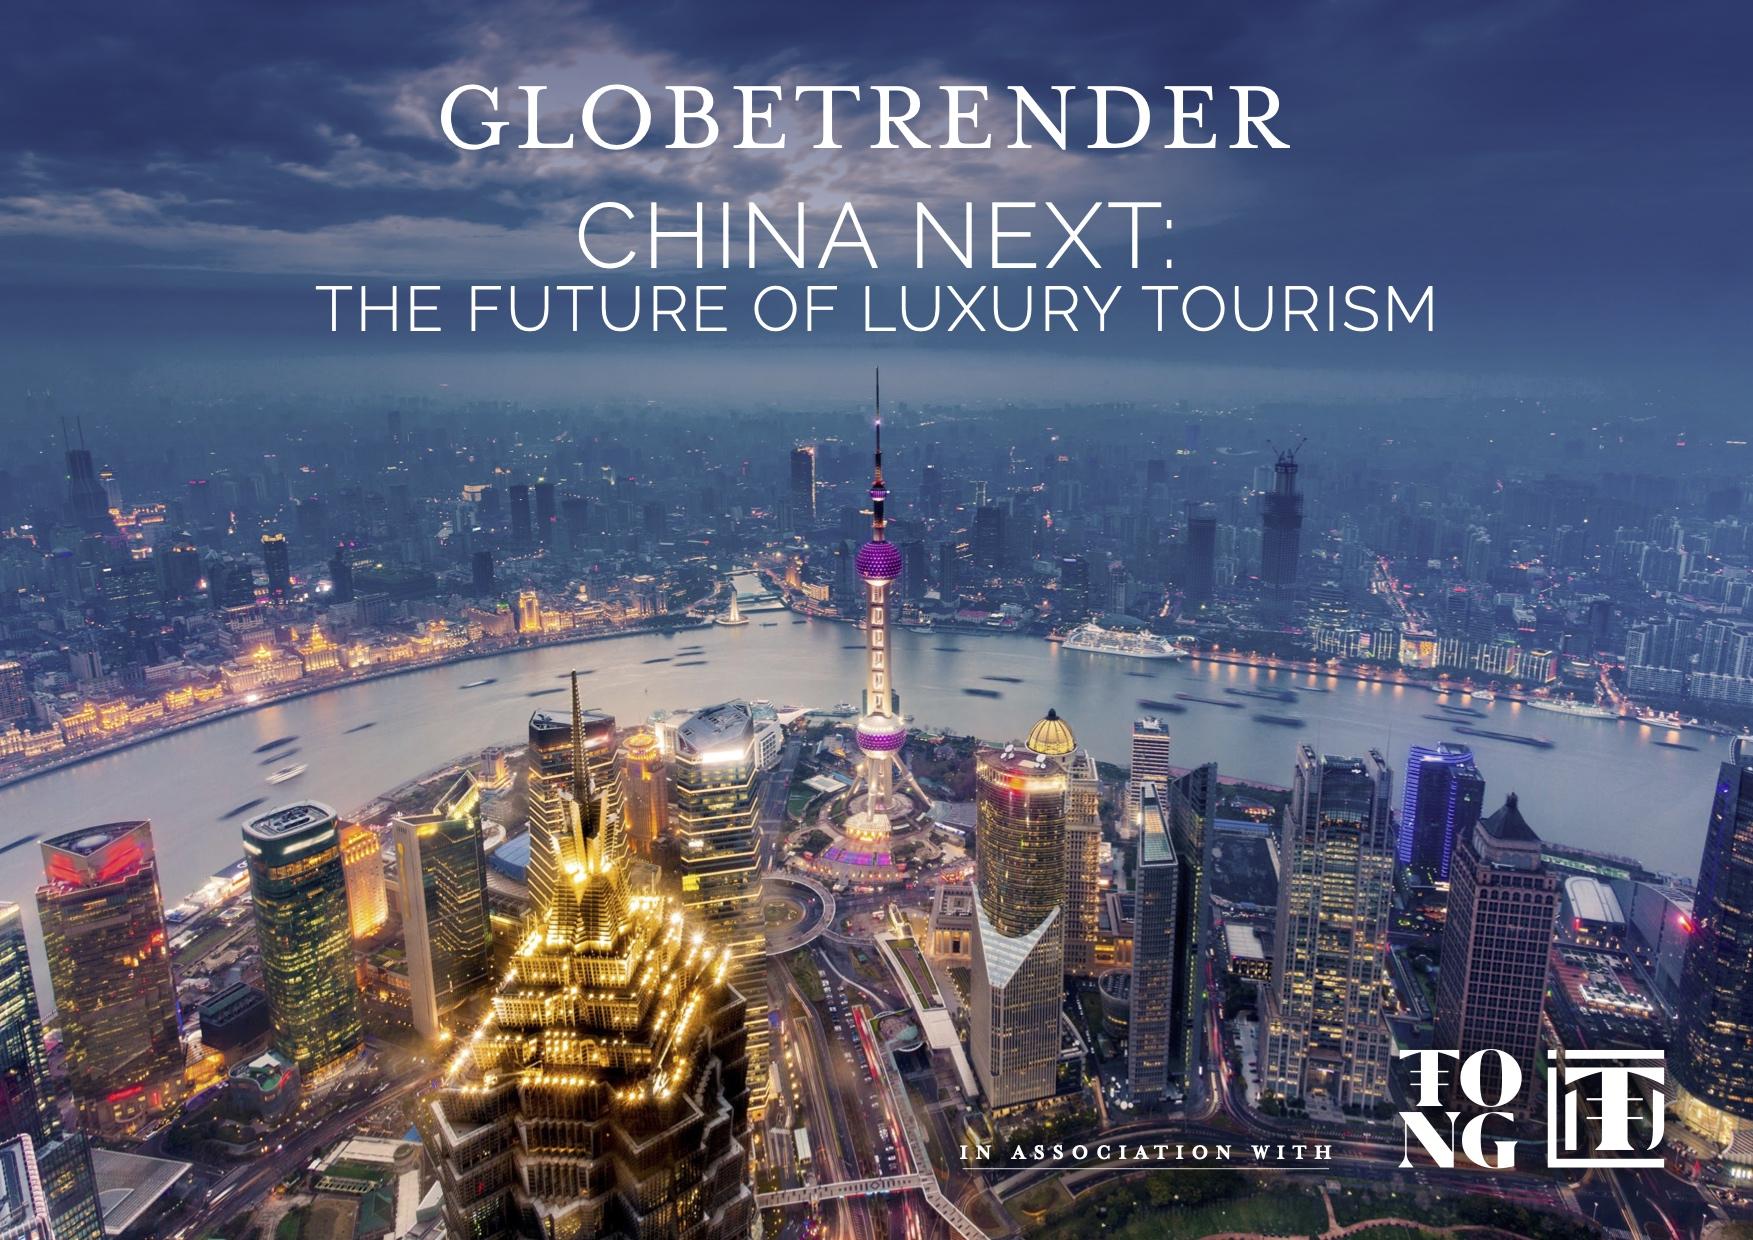 China Next The Future of Luxury Tourism